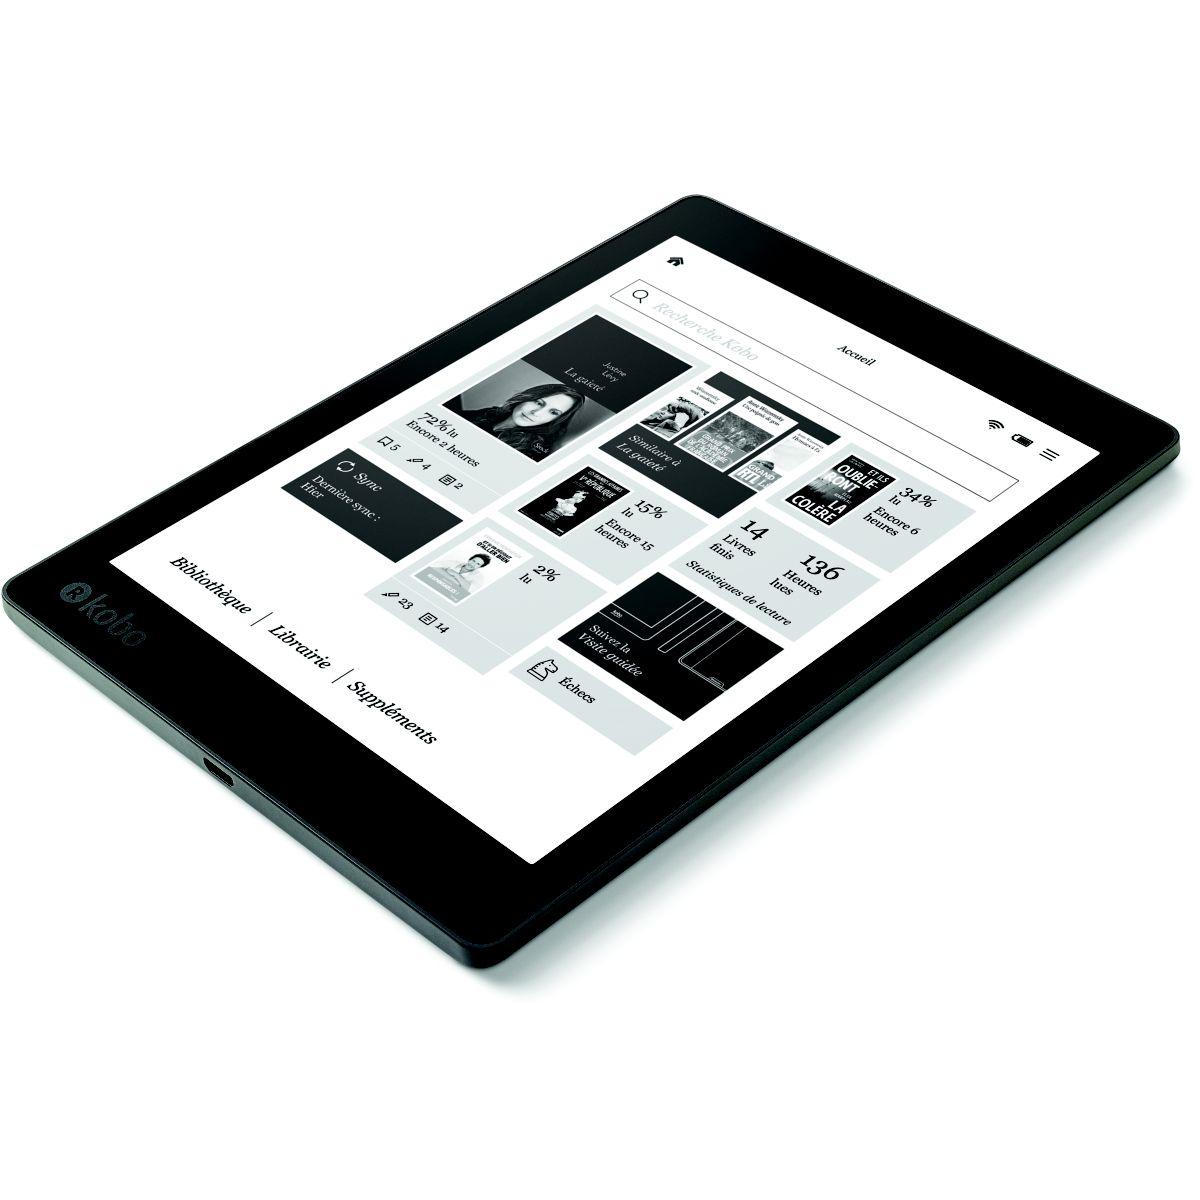 E-book kobo aura one - 2% de remise imm�diate avec le code : wd2 (photo)